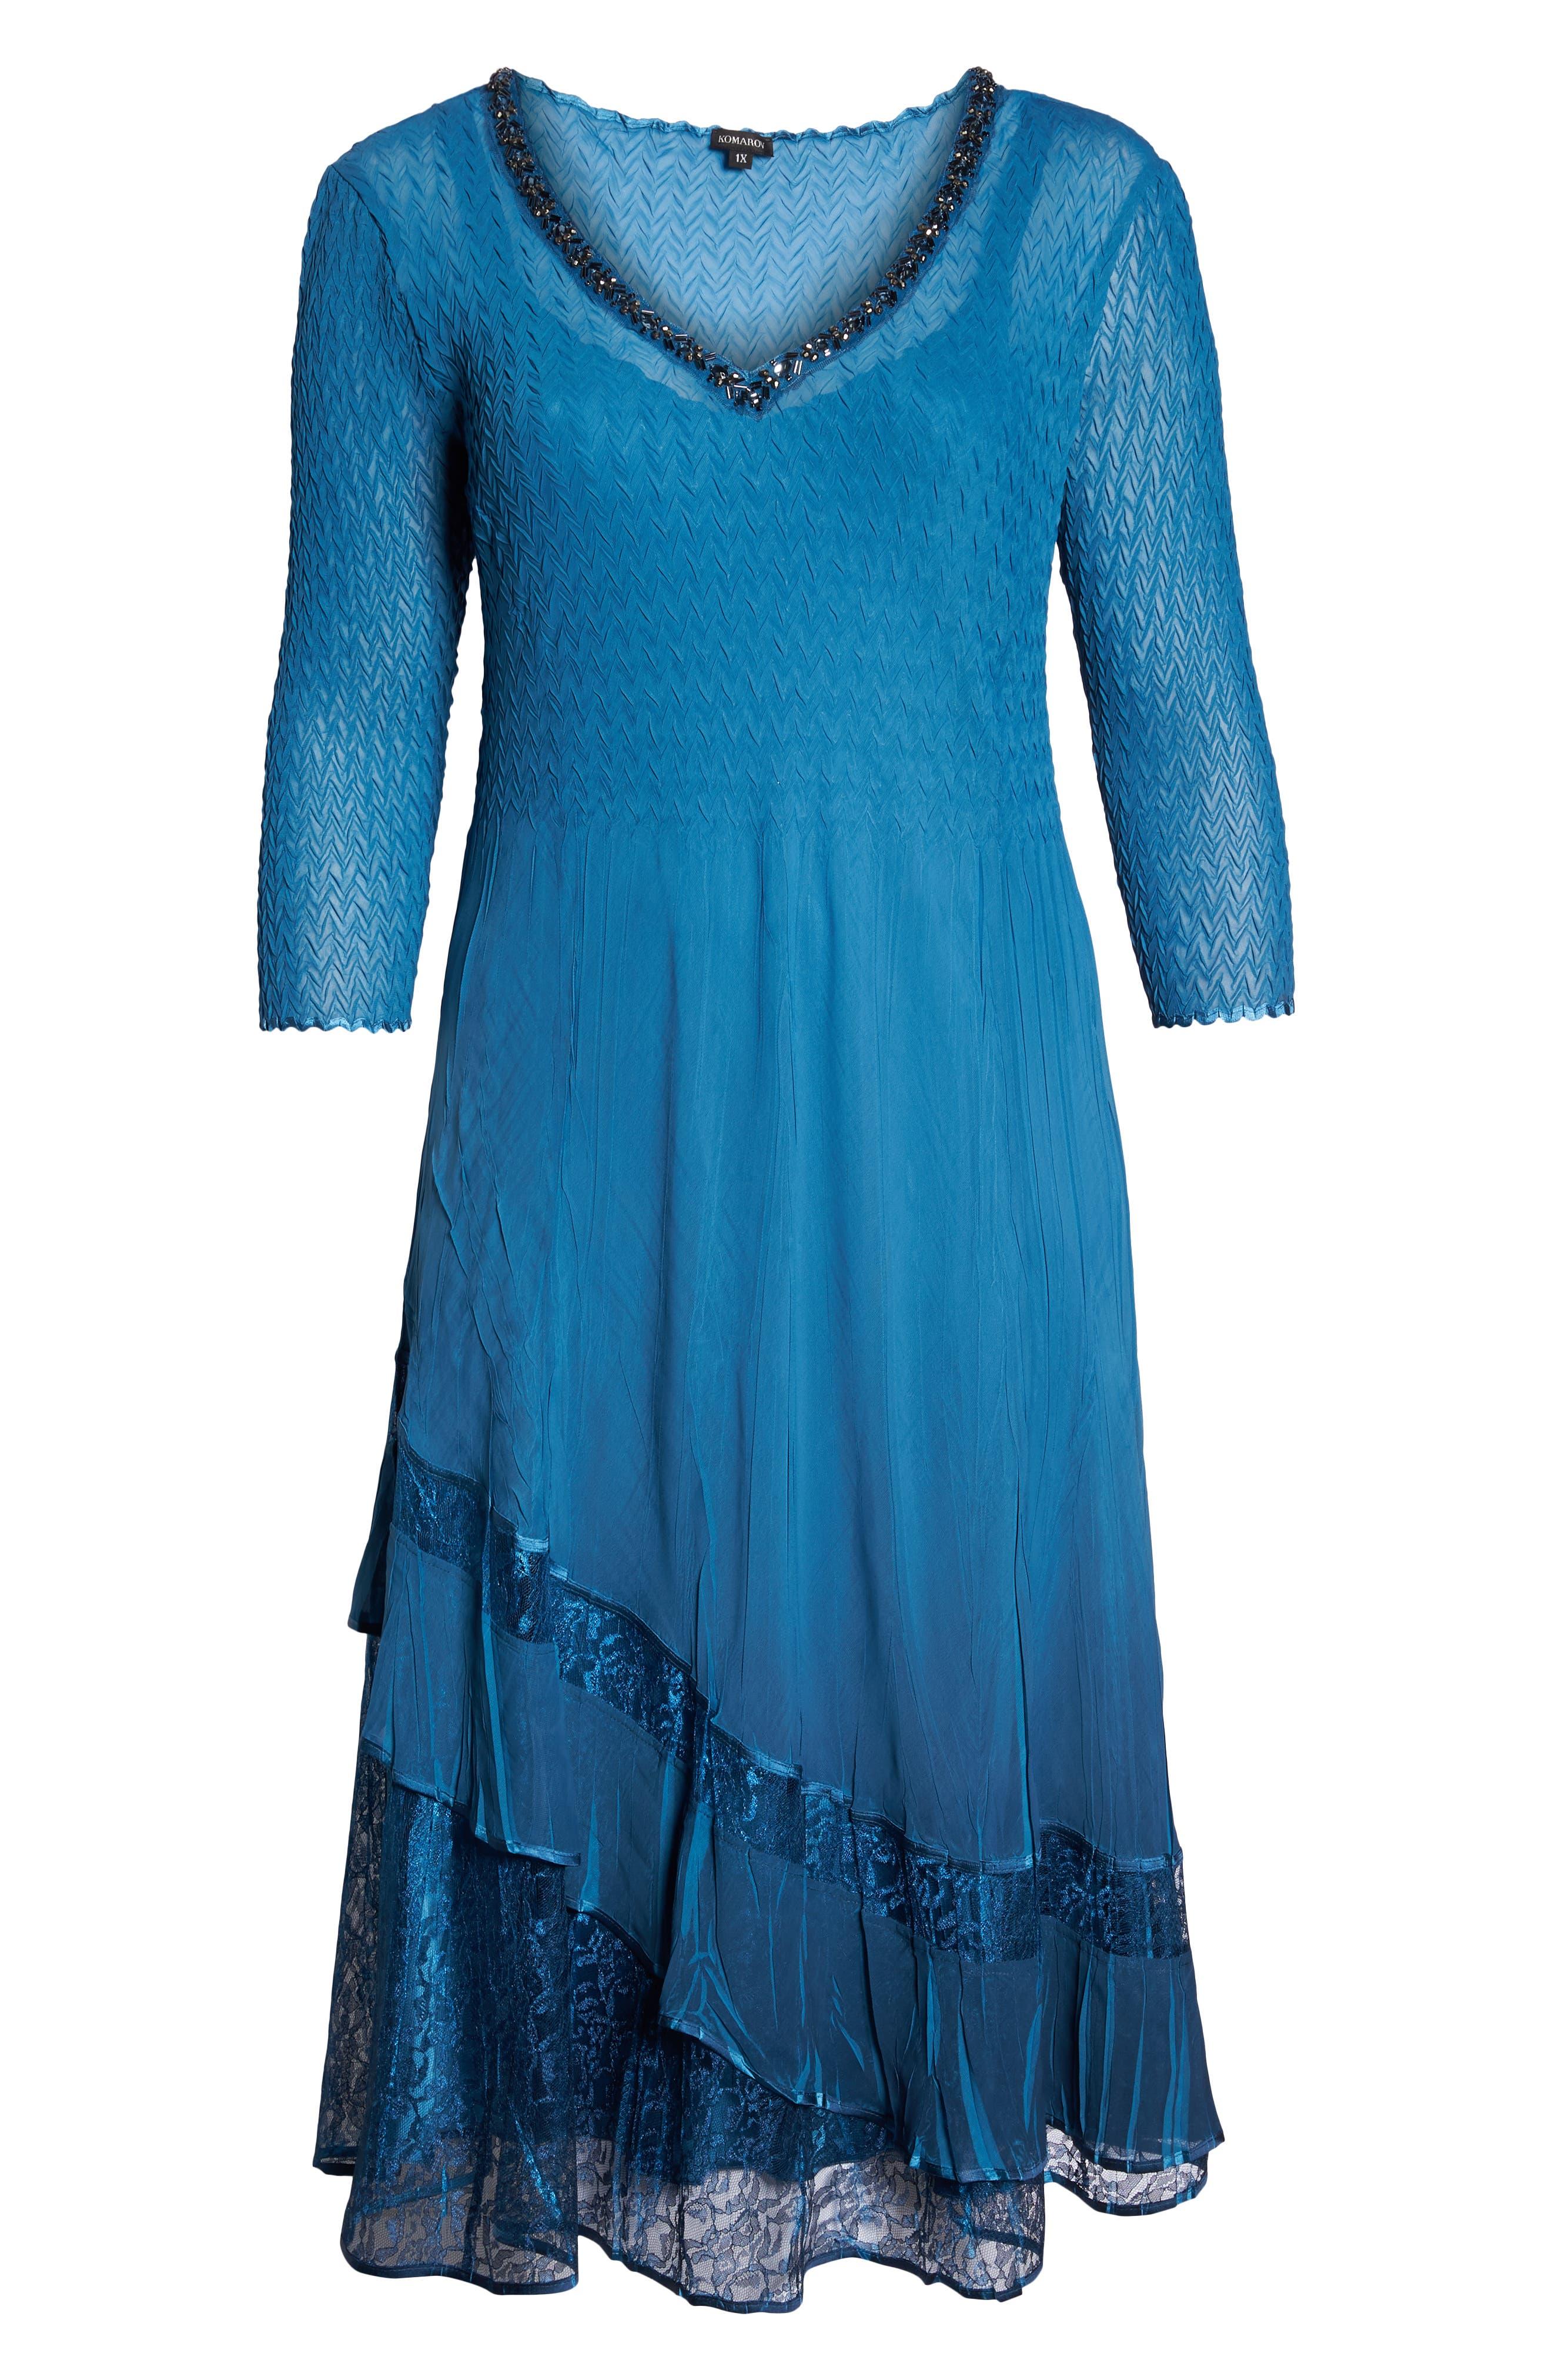 Beaded Neck Asymmetrical Charmeuse A-Line Dress,                             Alternate thumbnail 6, color,                             Blue Dusk Night Ombre